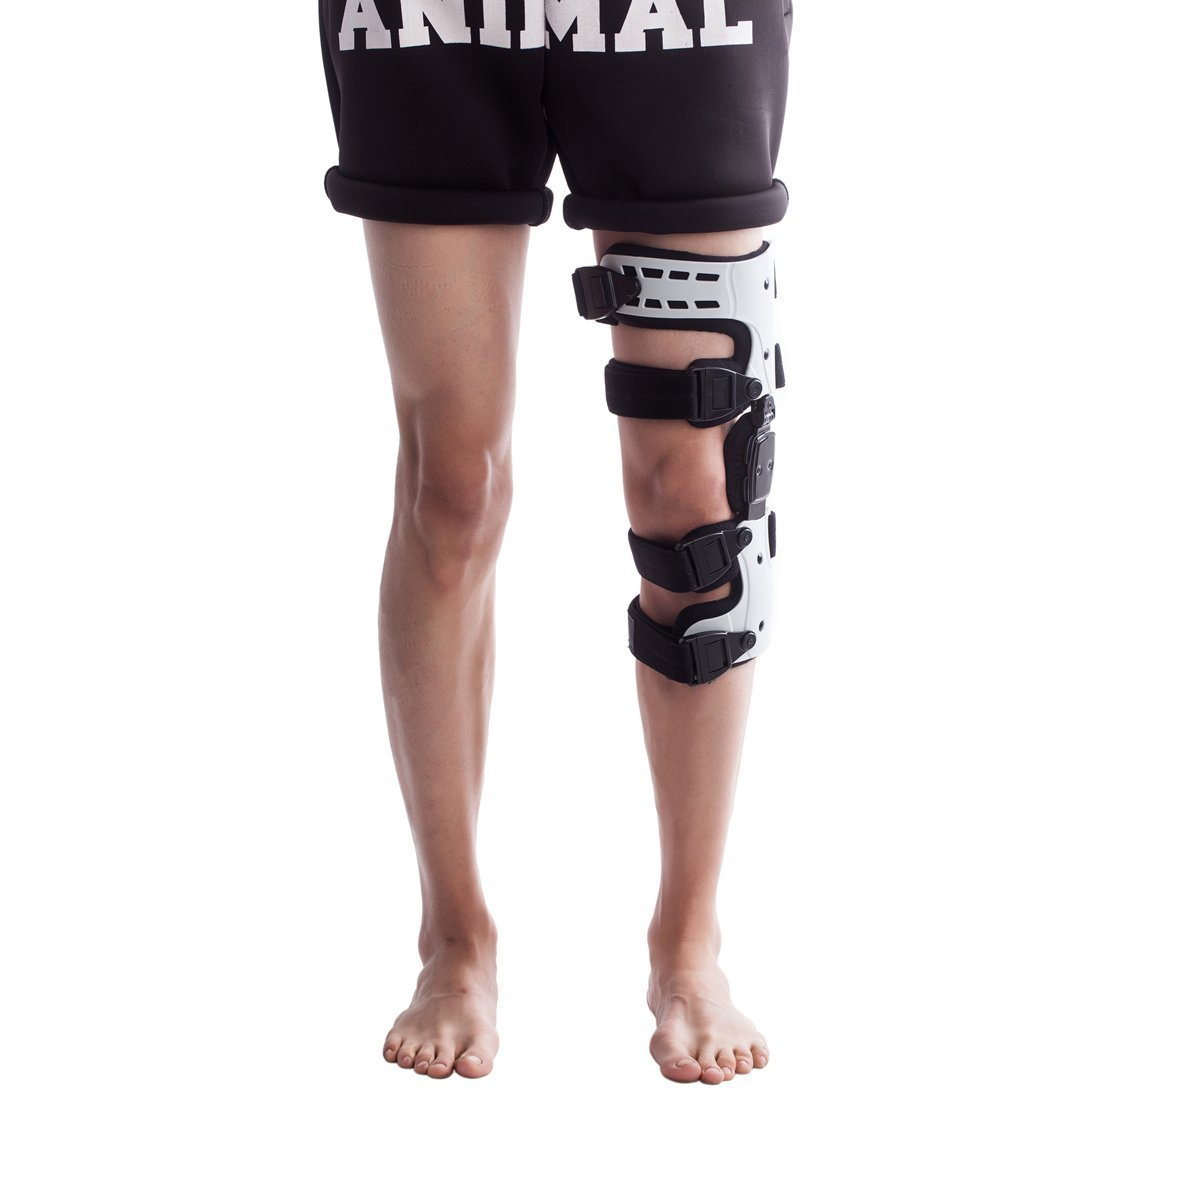 Orthomen OA Unloading Knee Brace for Osteoarthritis – Bone on Bone - Lateral Support - Size: Universal/Left by Orthomen (Image #2)